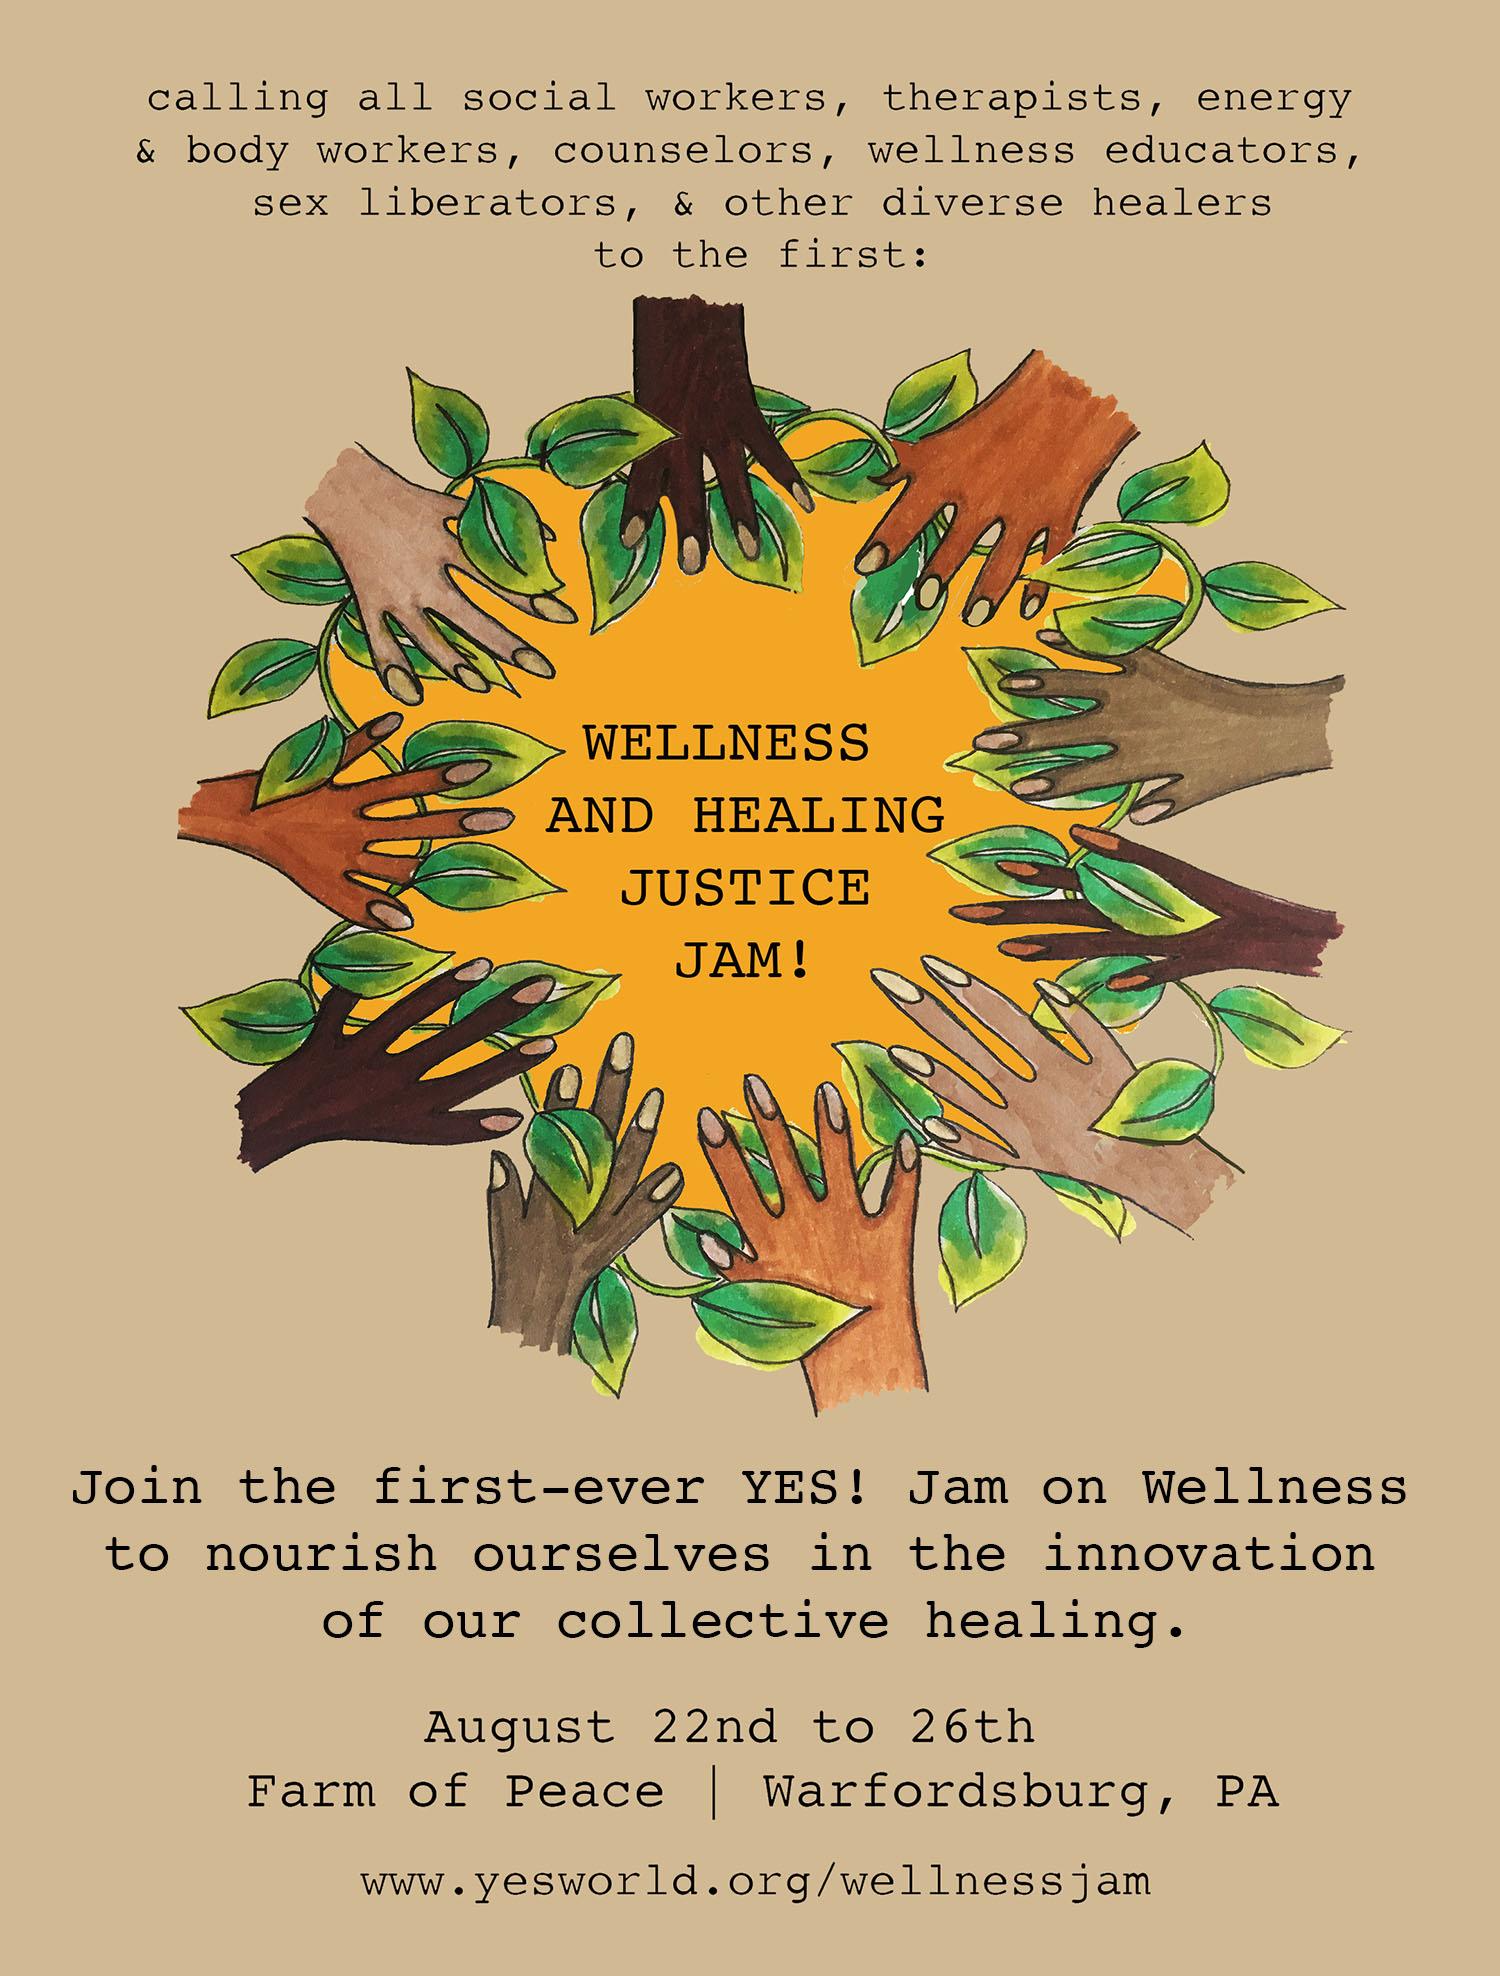 wellnessjamflyer3.jpg